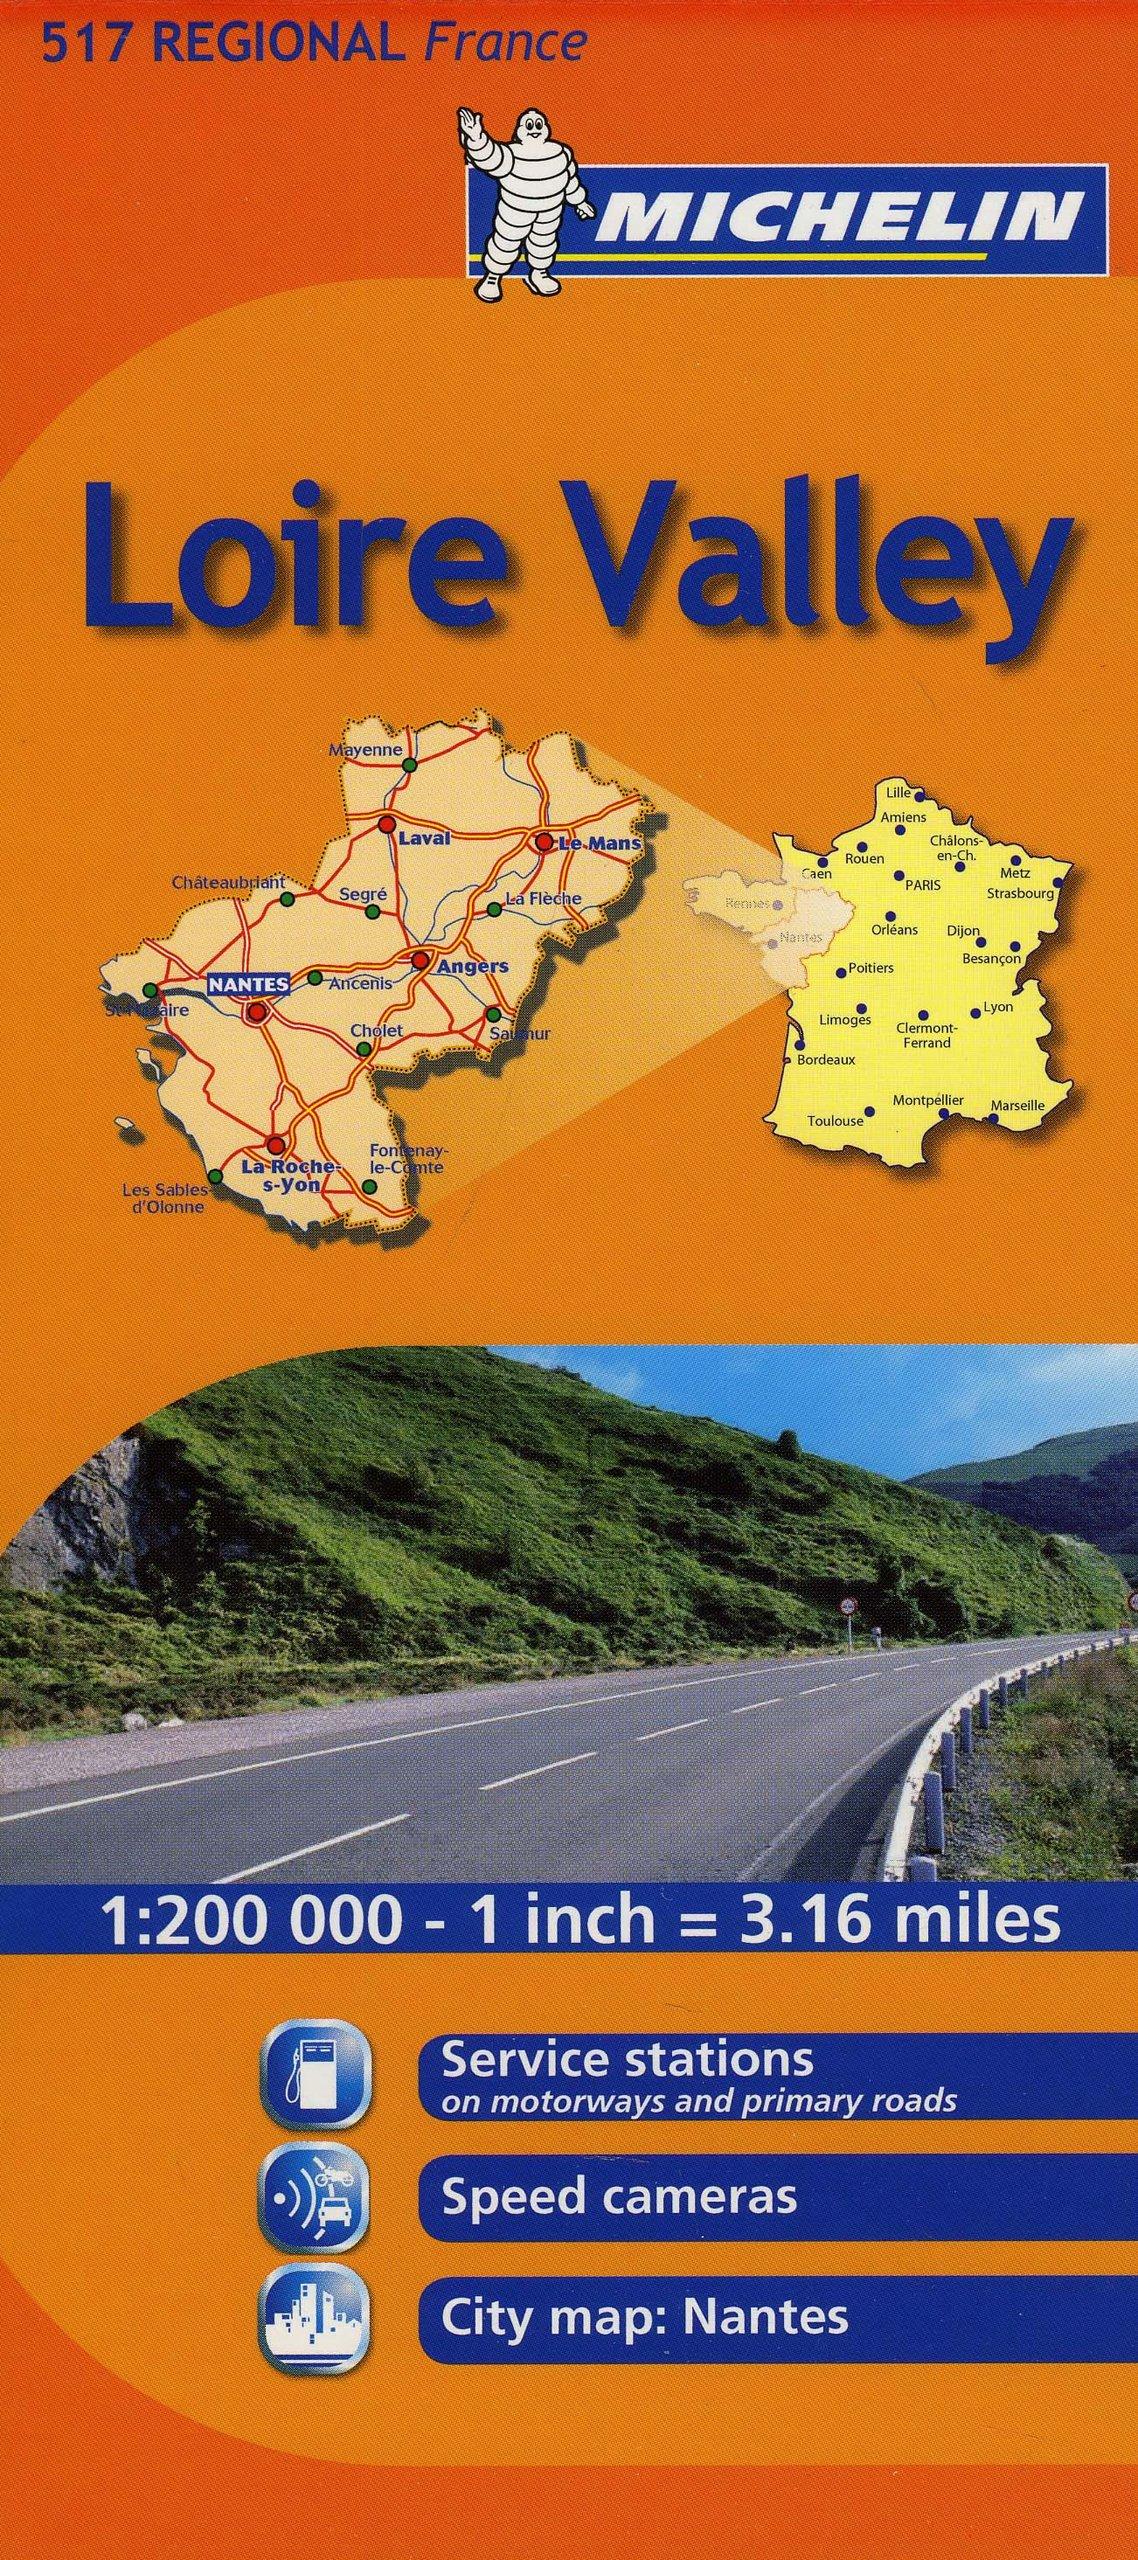 Michelin Map France: Loire Valley 517 (Maps/Regional ... on vercors france map, nord-pas-de-calais france map, vendee france map, ireland france map, auvergne france map, amsterdam france map, catalonia france map, st remy provence france map, salzburg france map, madrid france map, chartres france map, normandy france map, palais des papes france map, rome france map, de loire france map, carriveau france map, scotland france map, tours france map, the dordogne france map, austria france map,